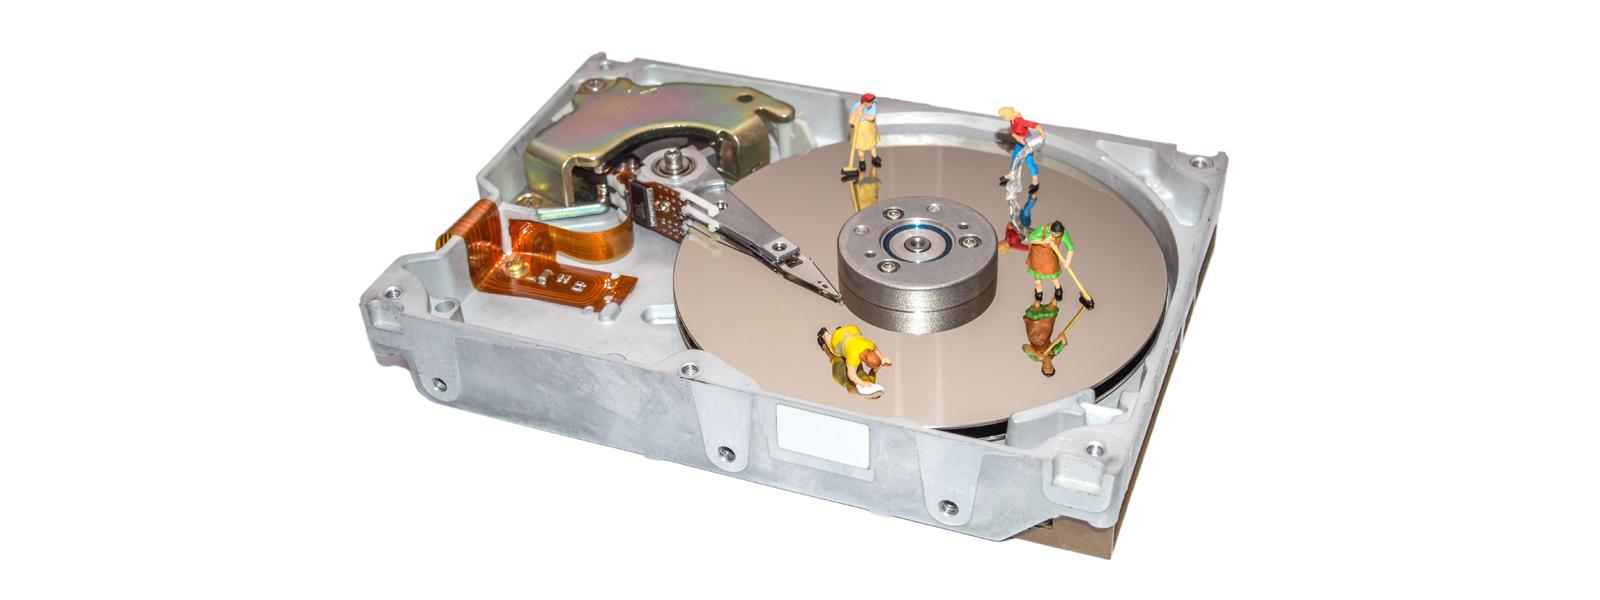 how to wipe a computer drive | Computing Australia